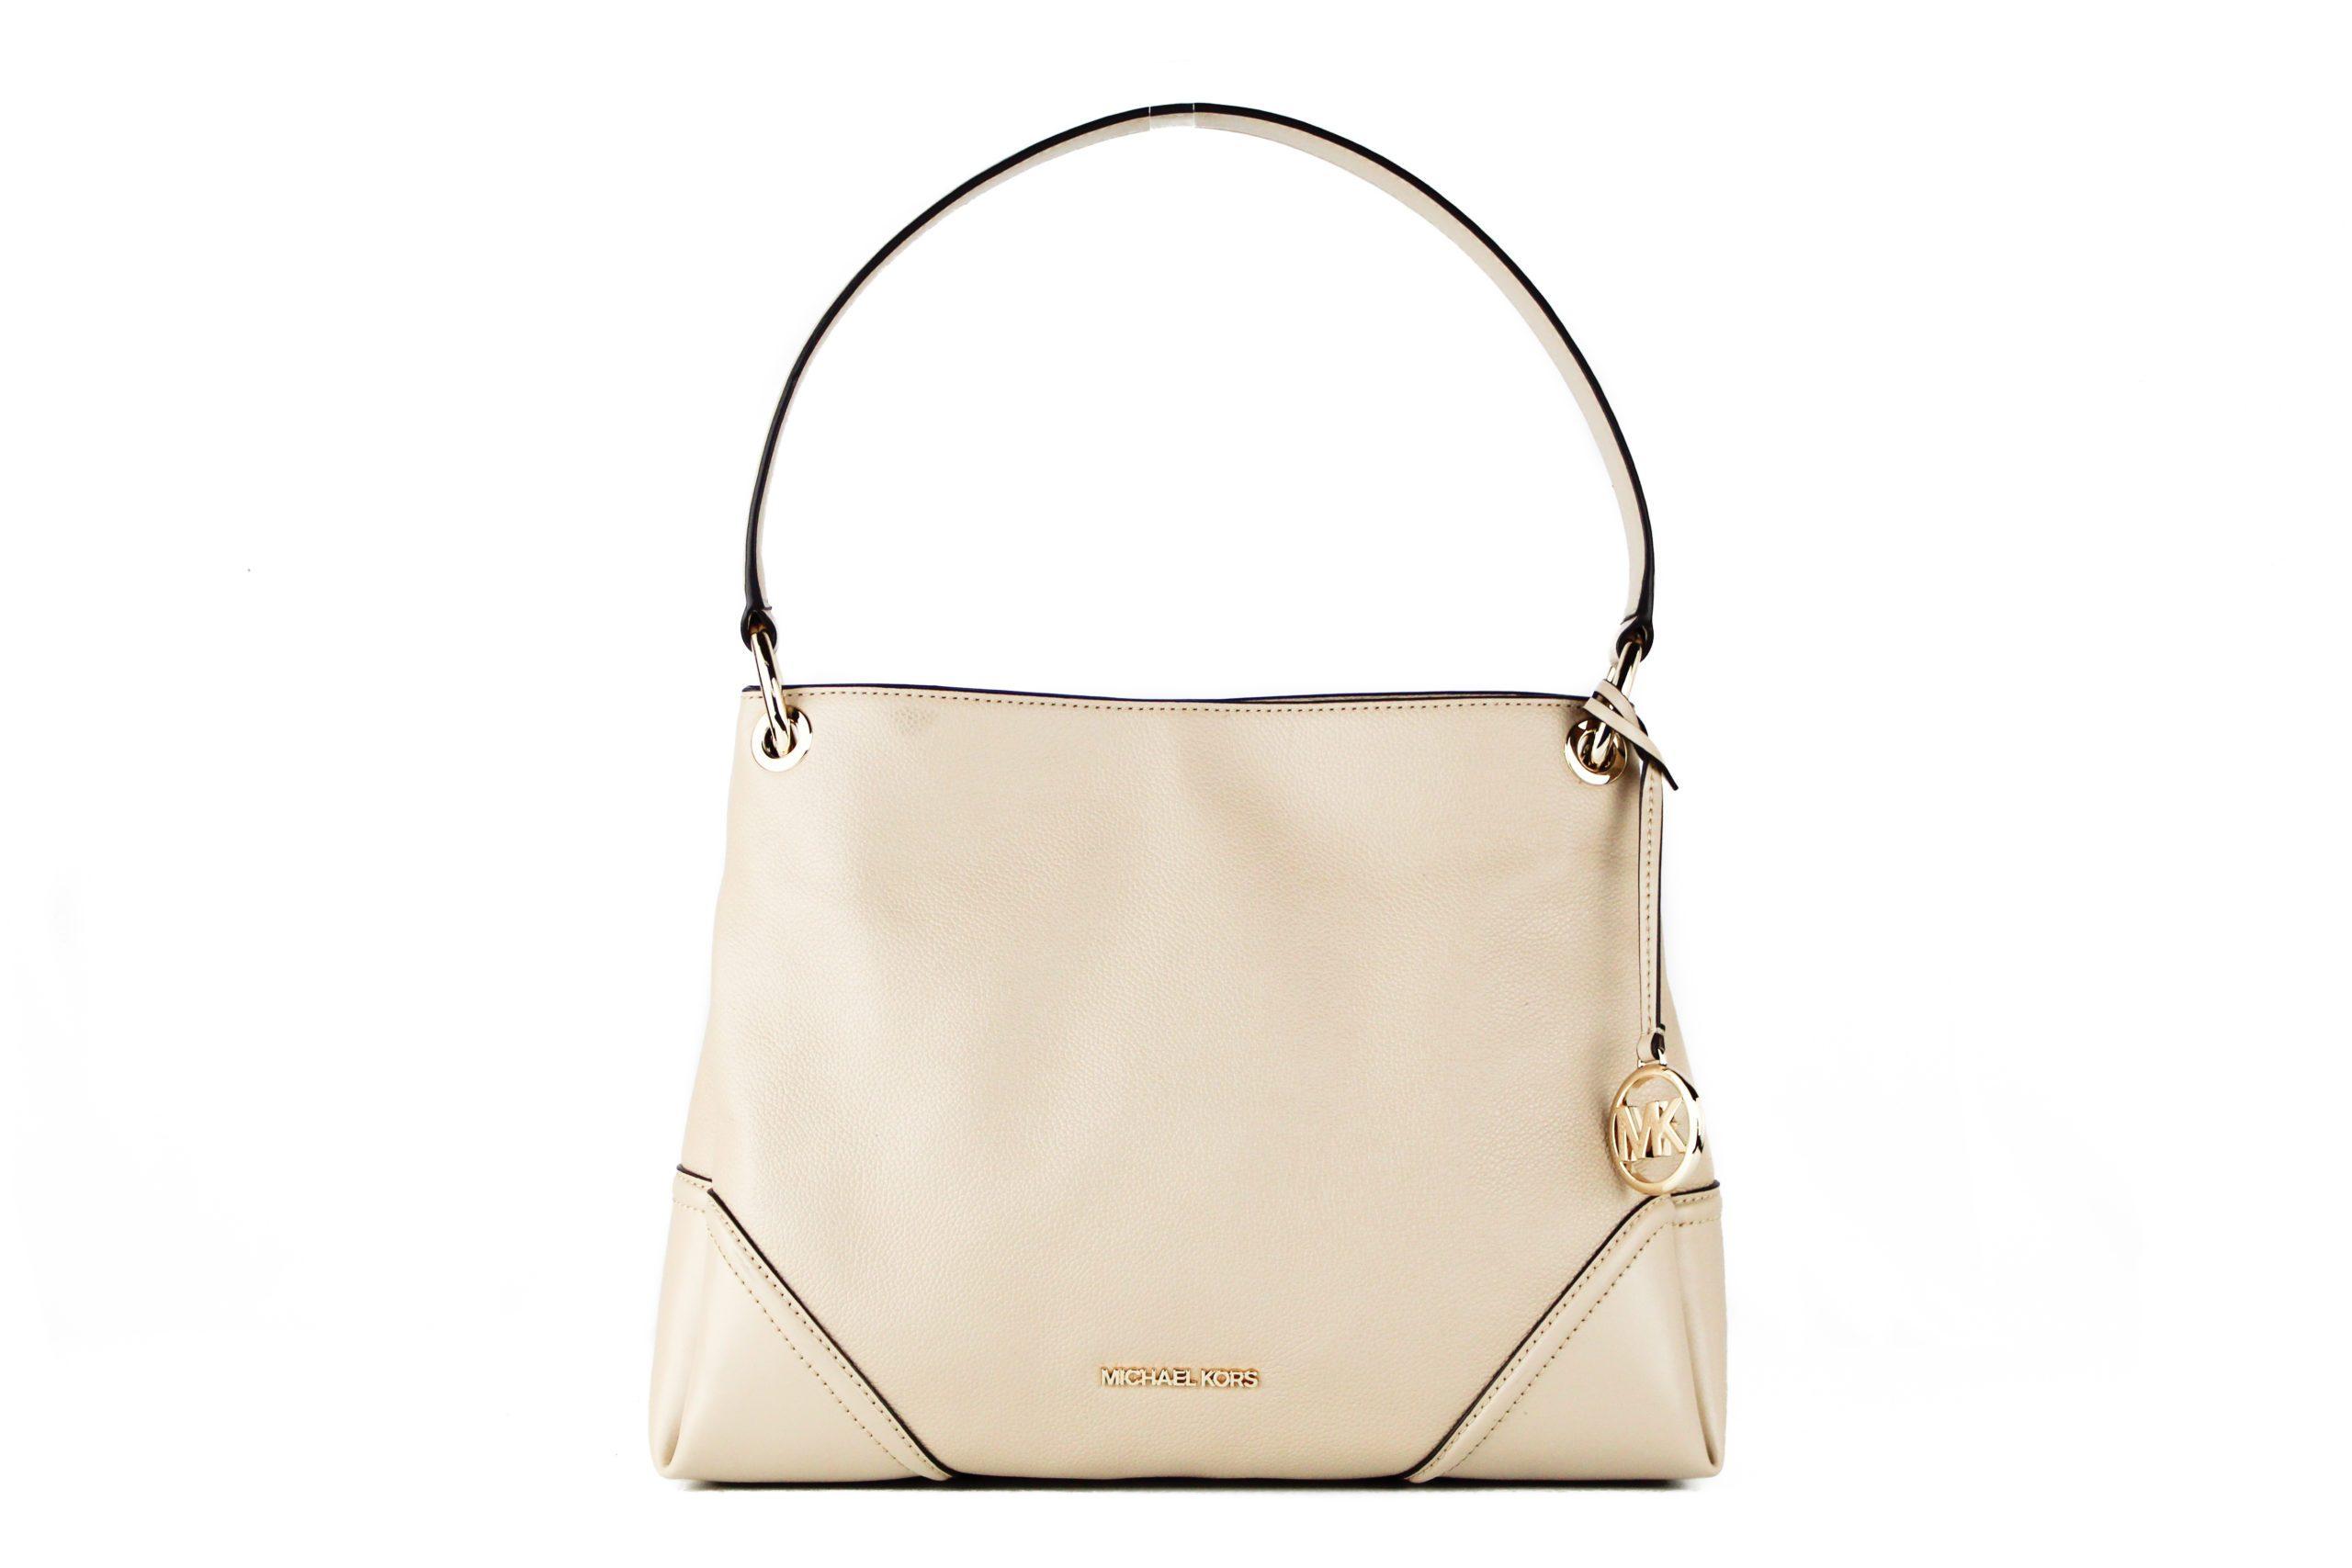 Michael Kors Women's Nicole Medium Leather Shoulder Bag Beige 70832